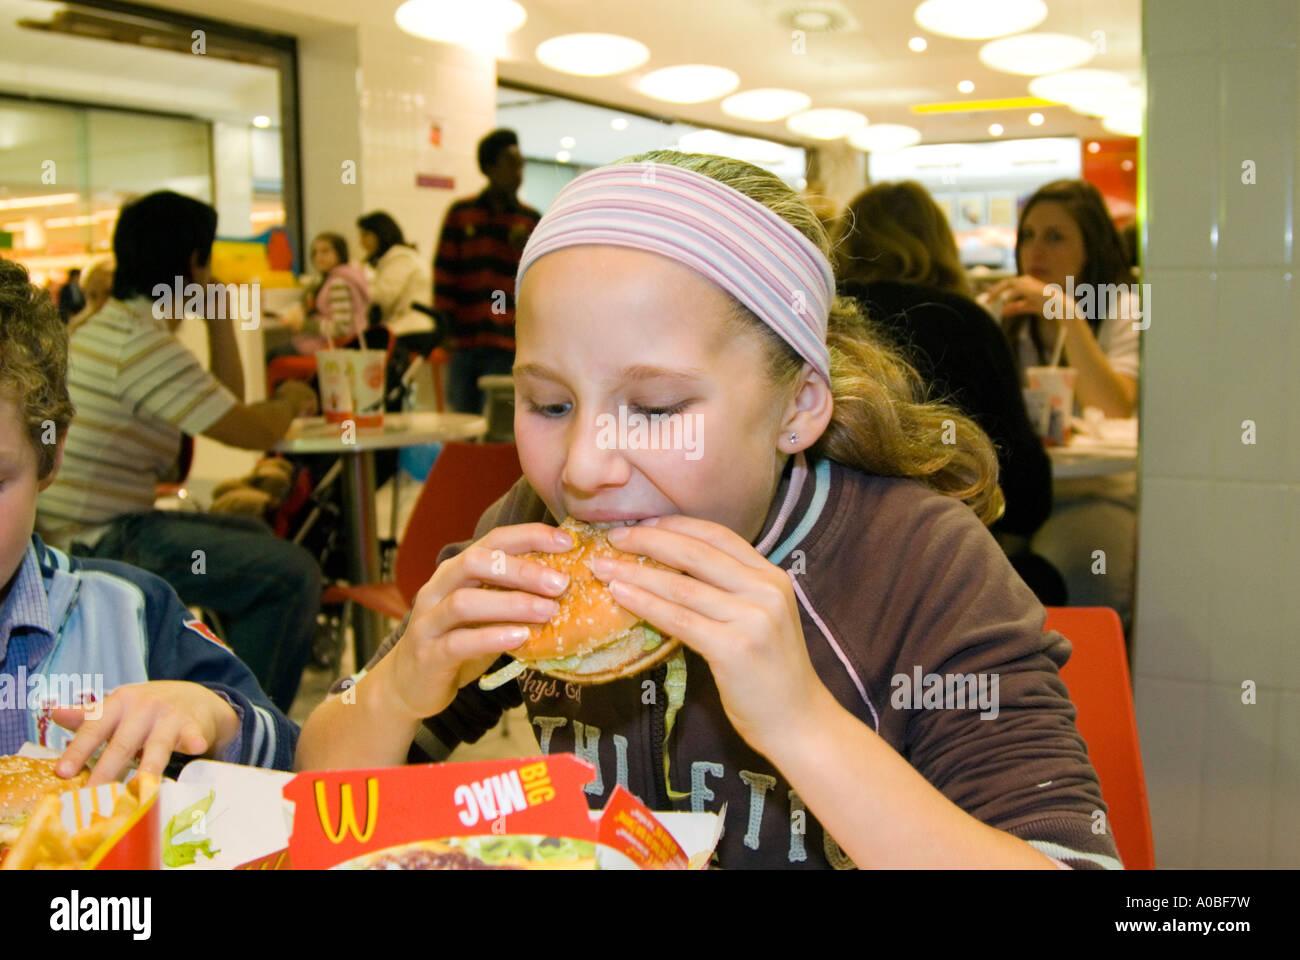 Child eating McDonald's Big Mac hamburger England UK - Stock Image